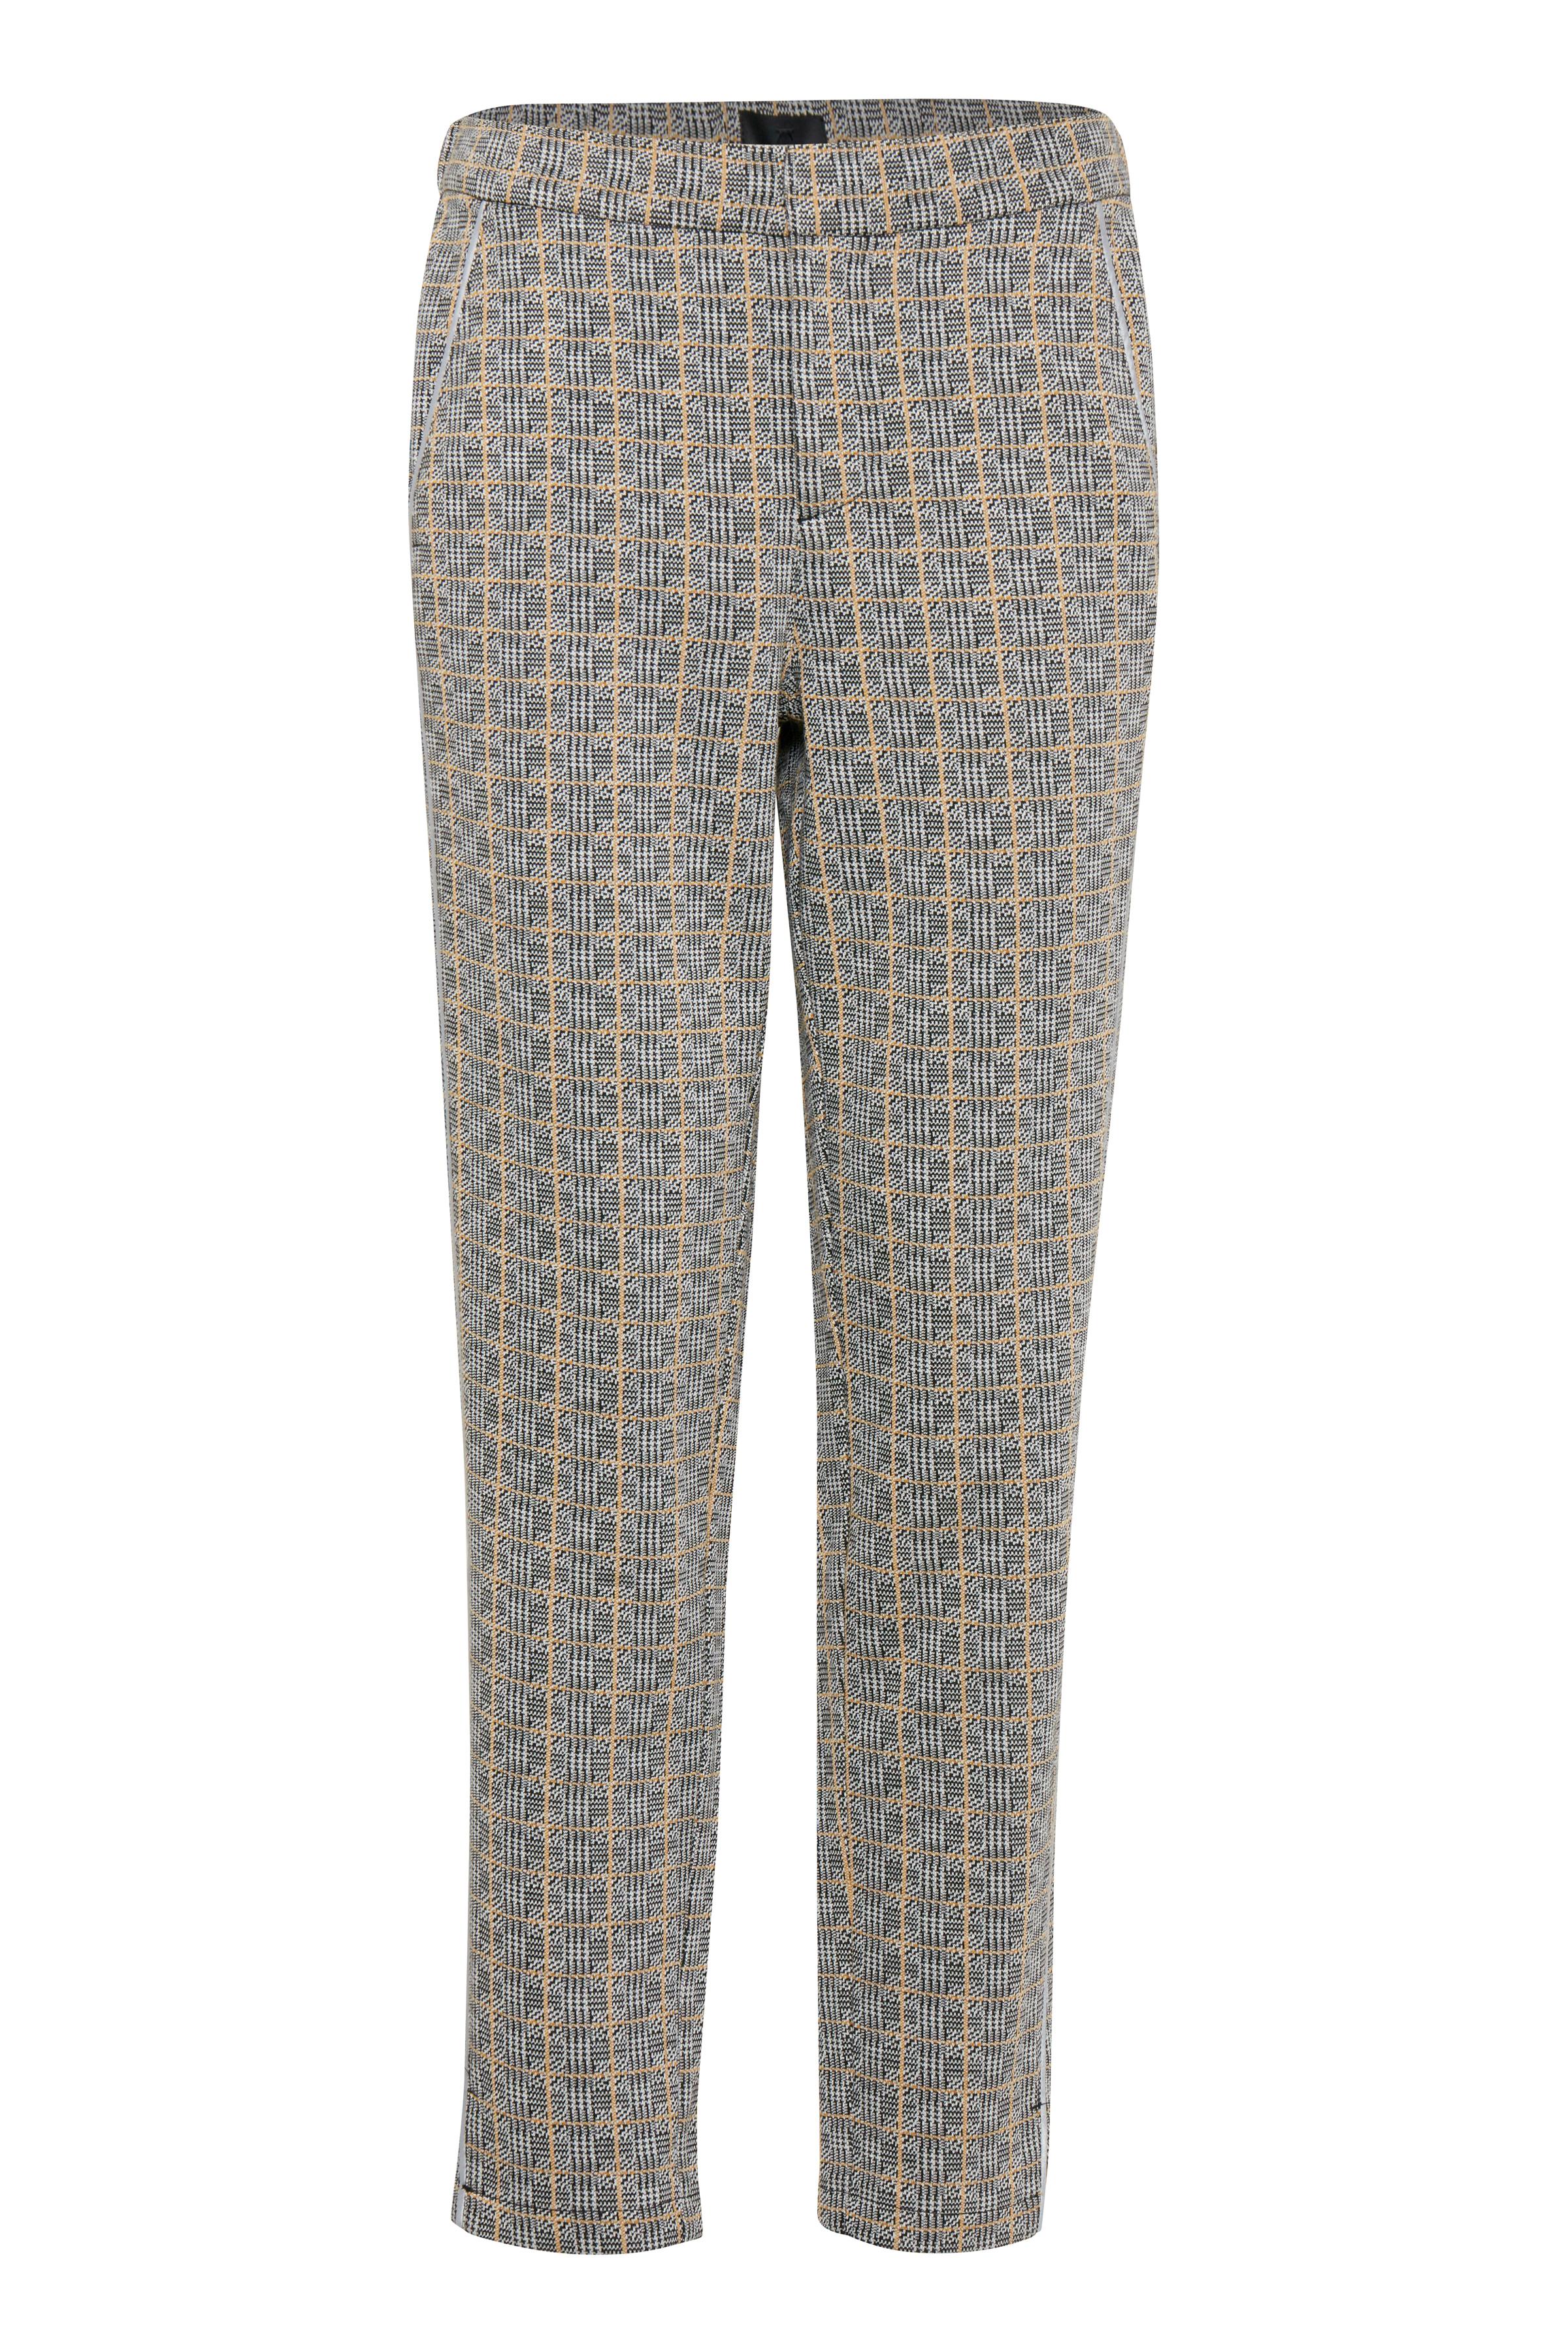 Sort/off-white Casual bukser fra Pulz Jeans – Køb Sort/off-white Casual bukser fra str. 32-46 her